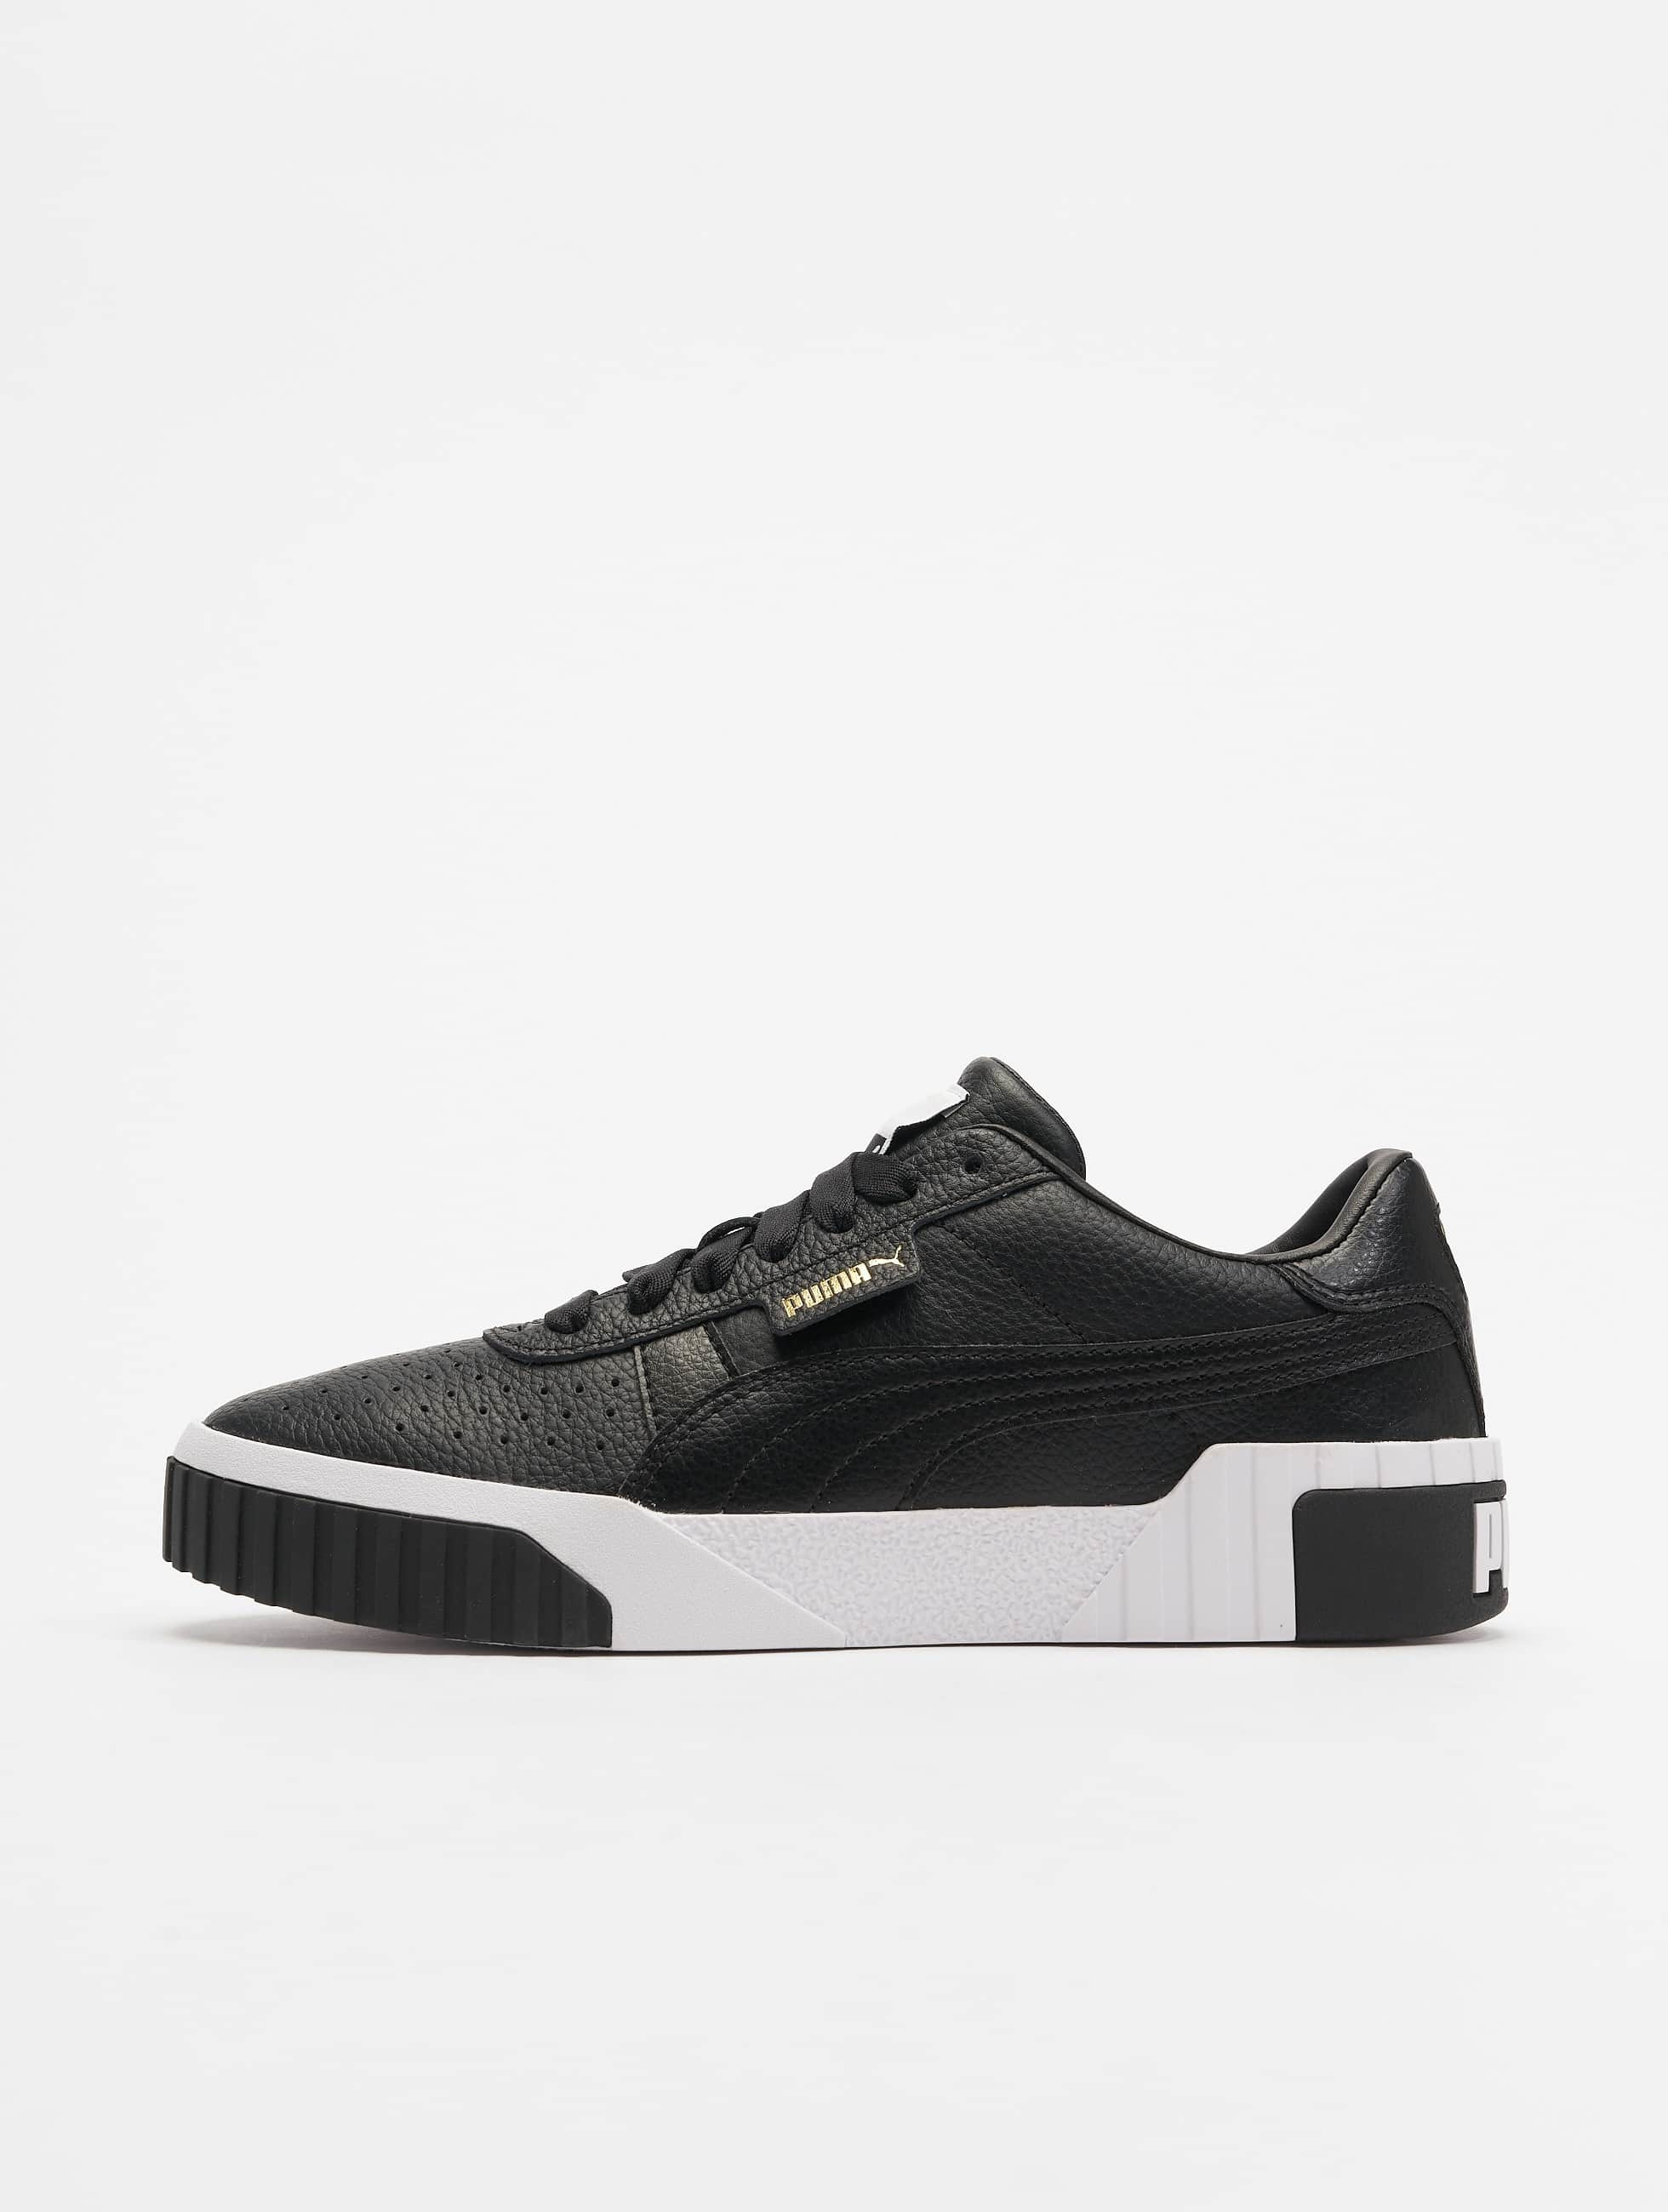 2902c49e755 Puma schoen / sneaker Cali Women's in zwart 614990